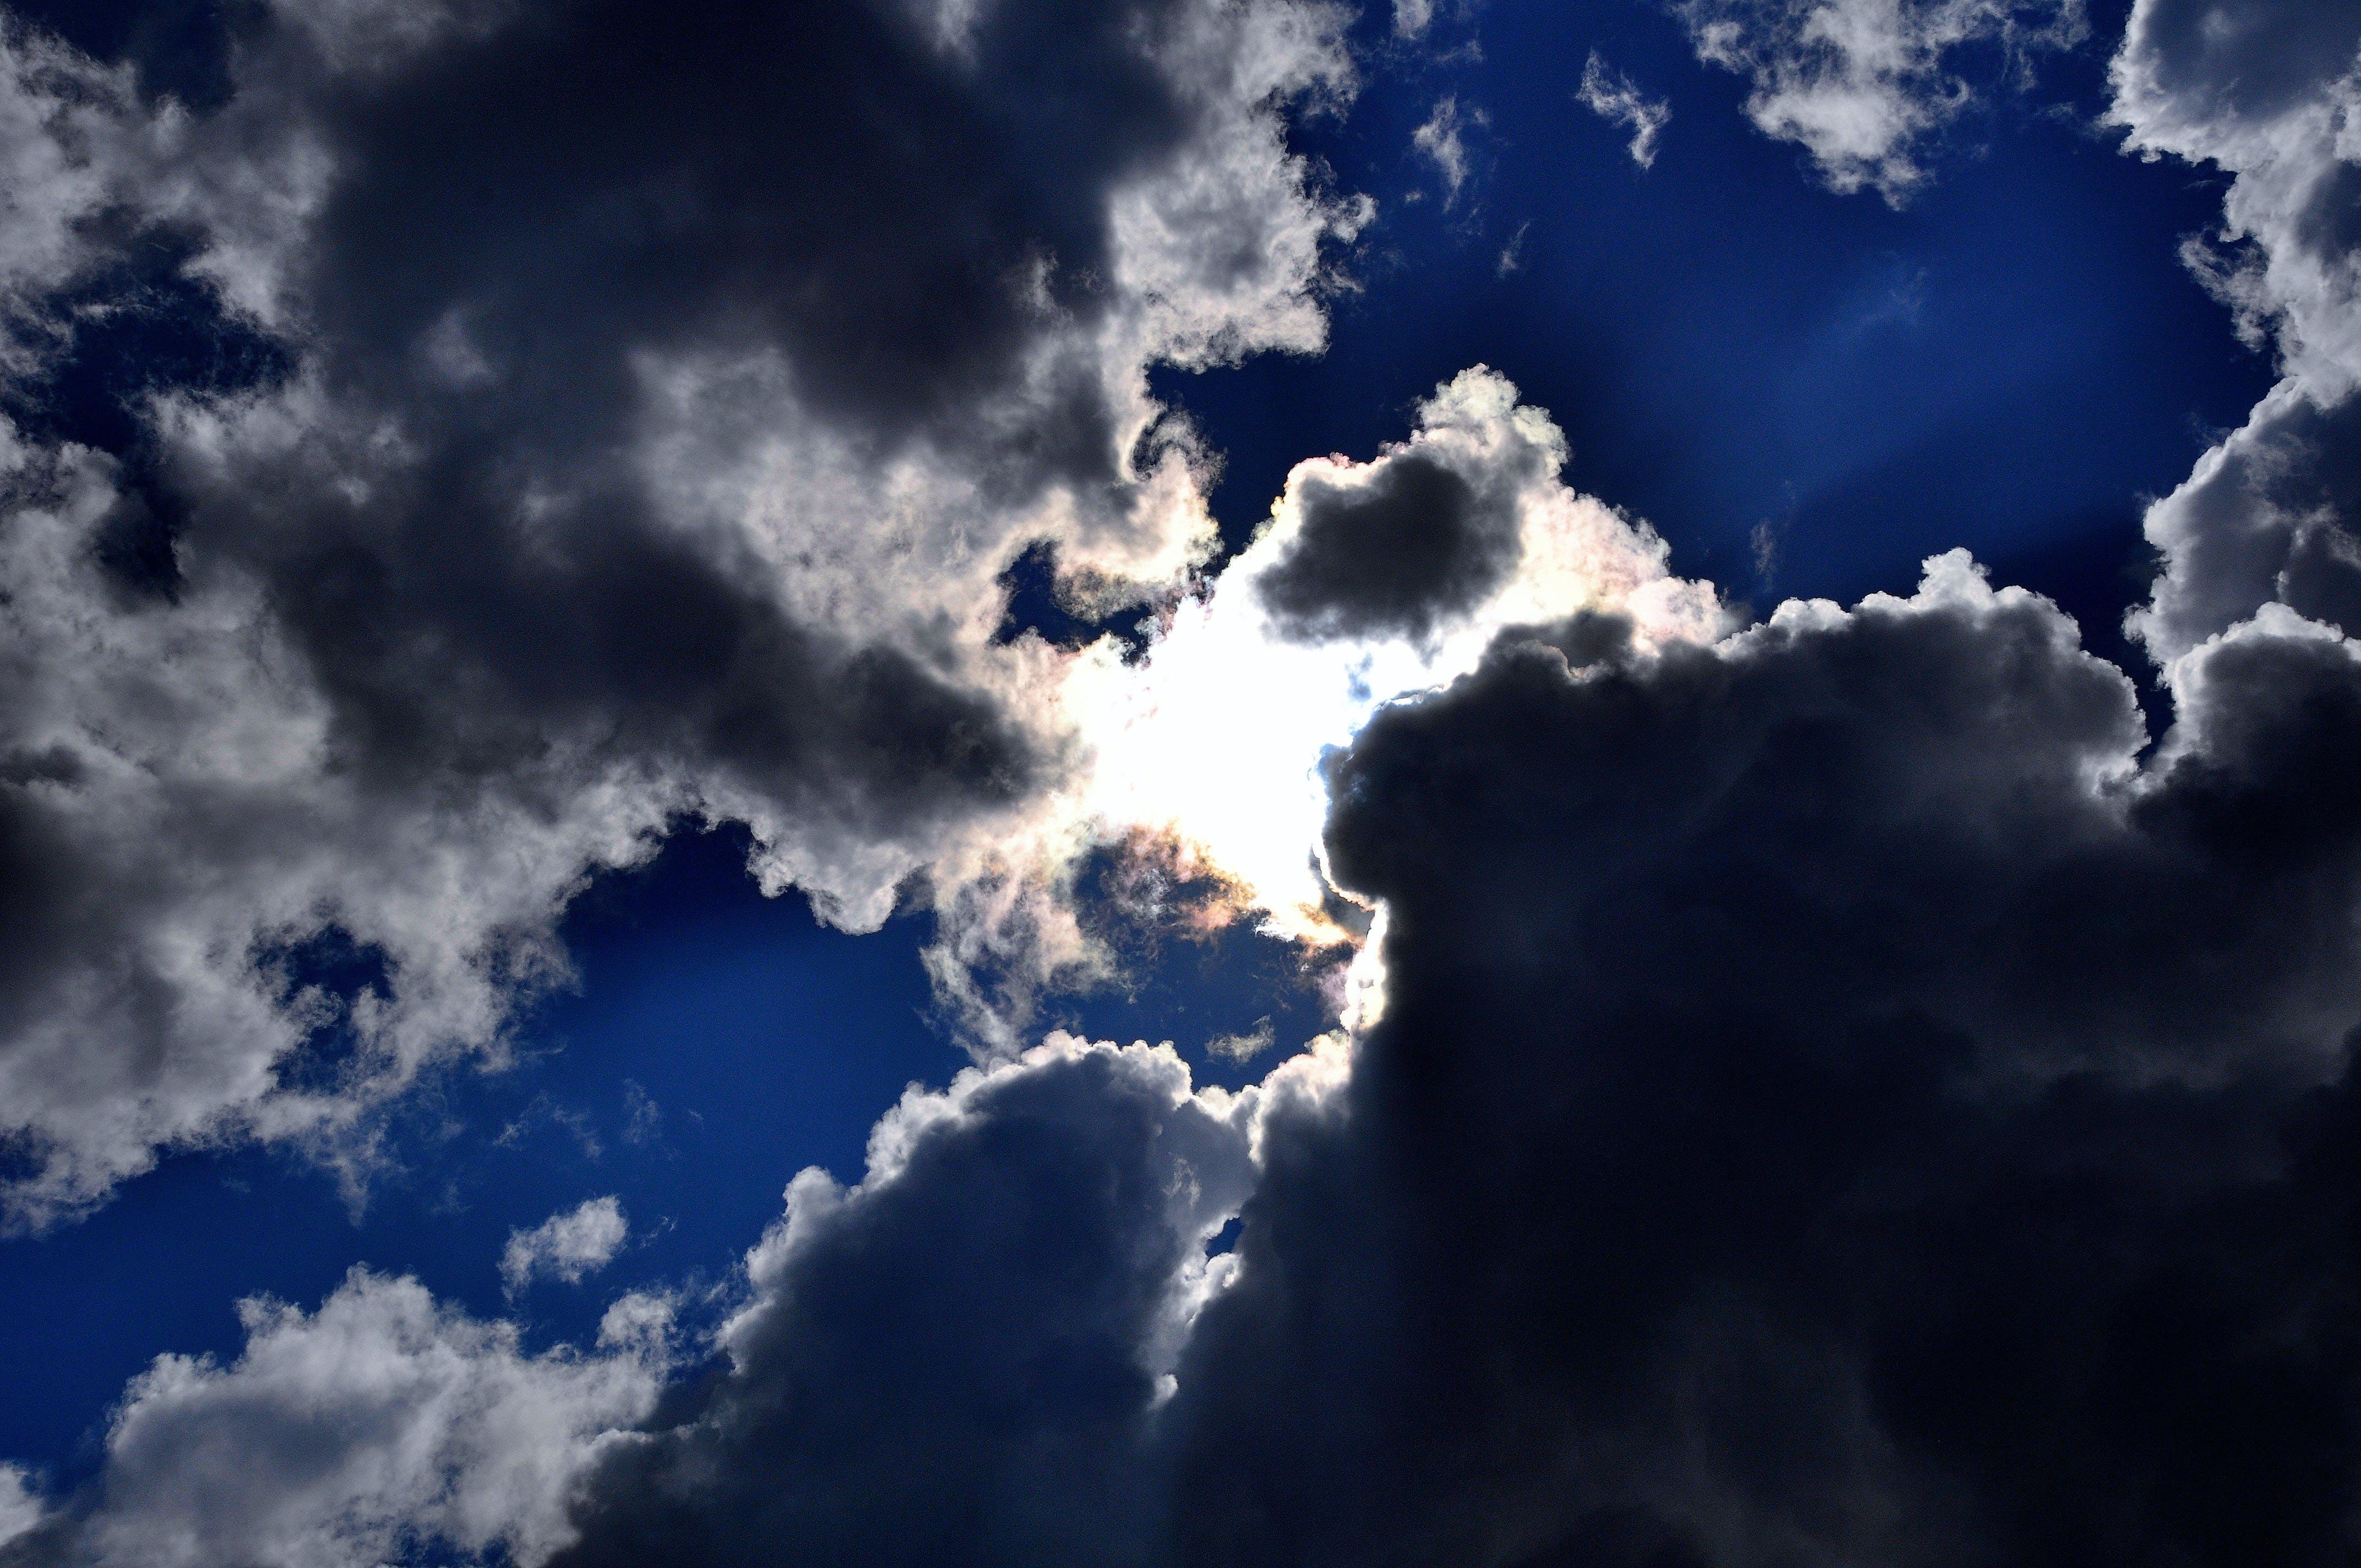 Cel fosc, núvol, sol